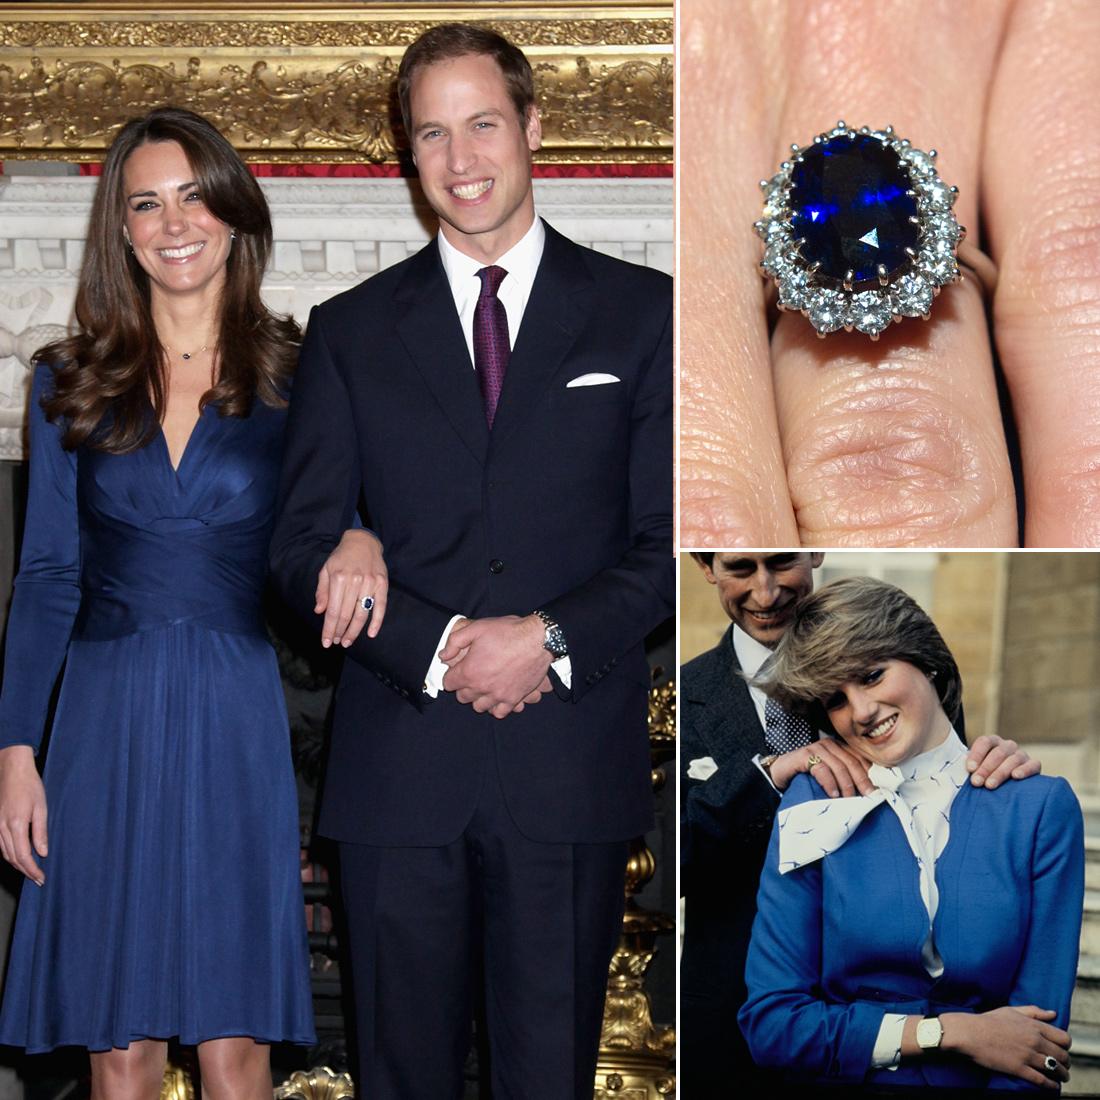 Princess Diana's Engagement Ring - 496.3KB